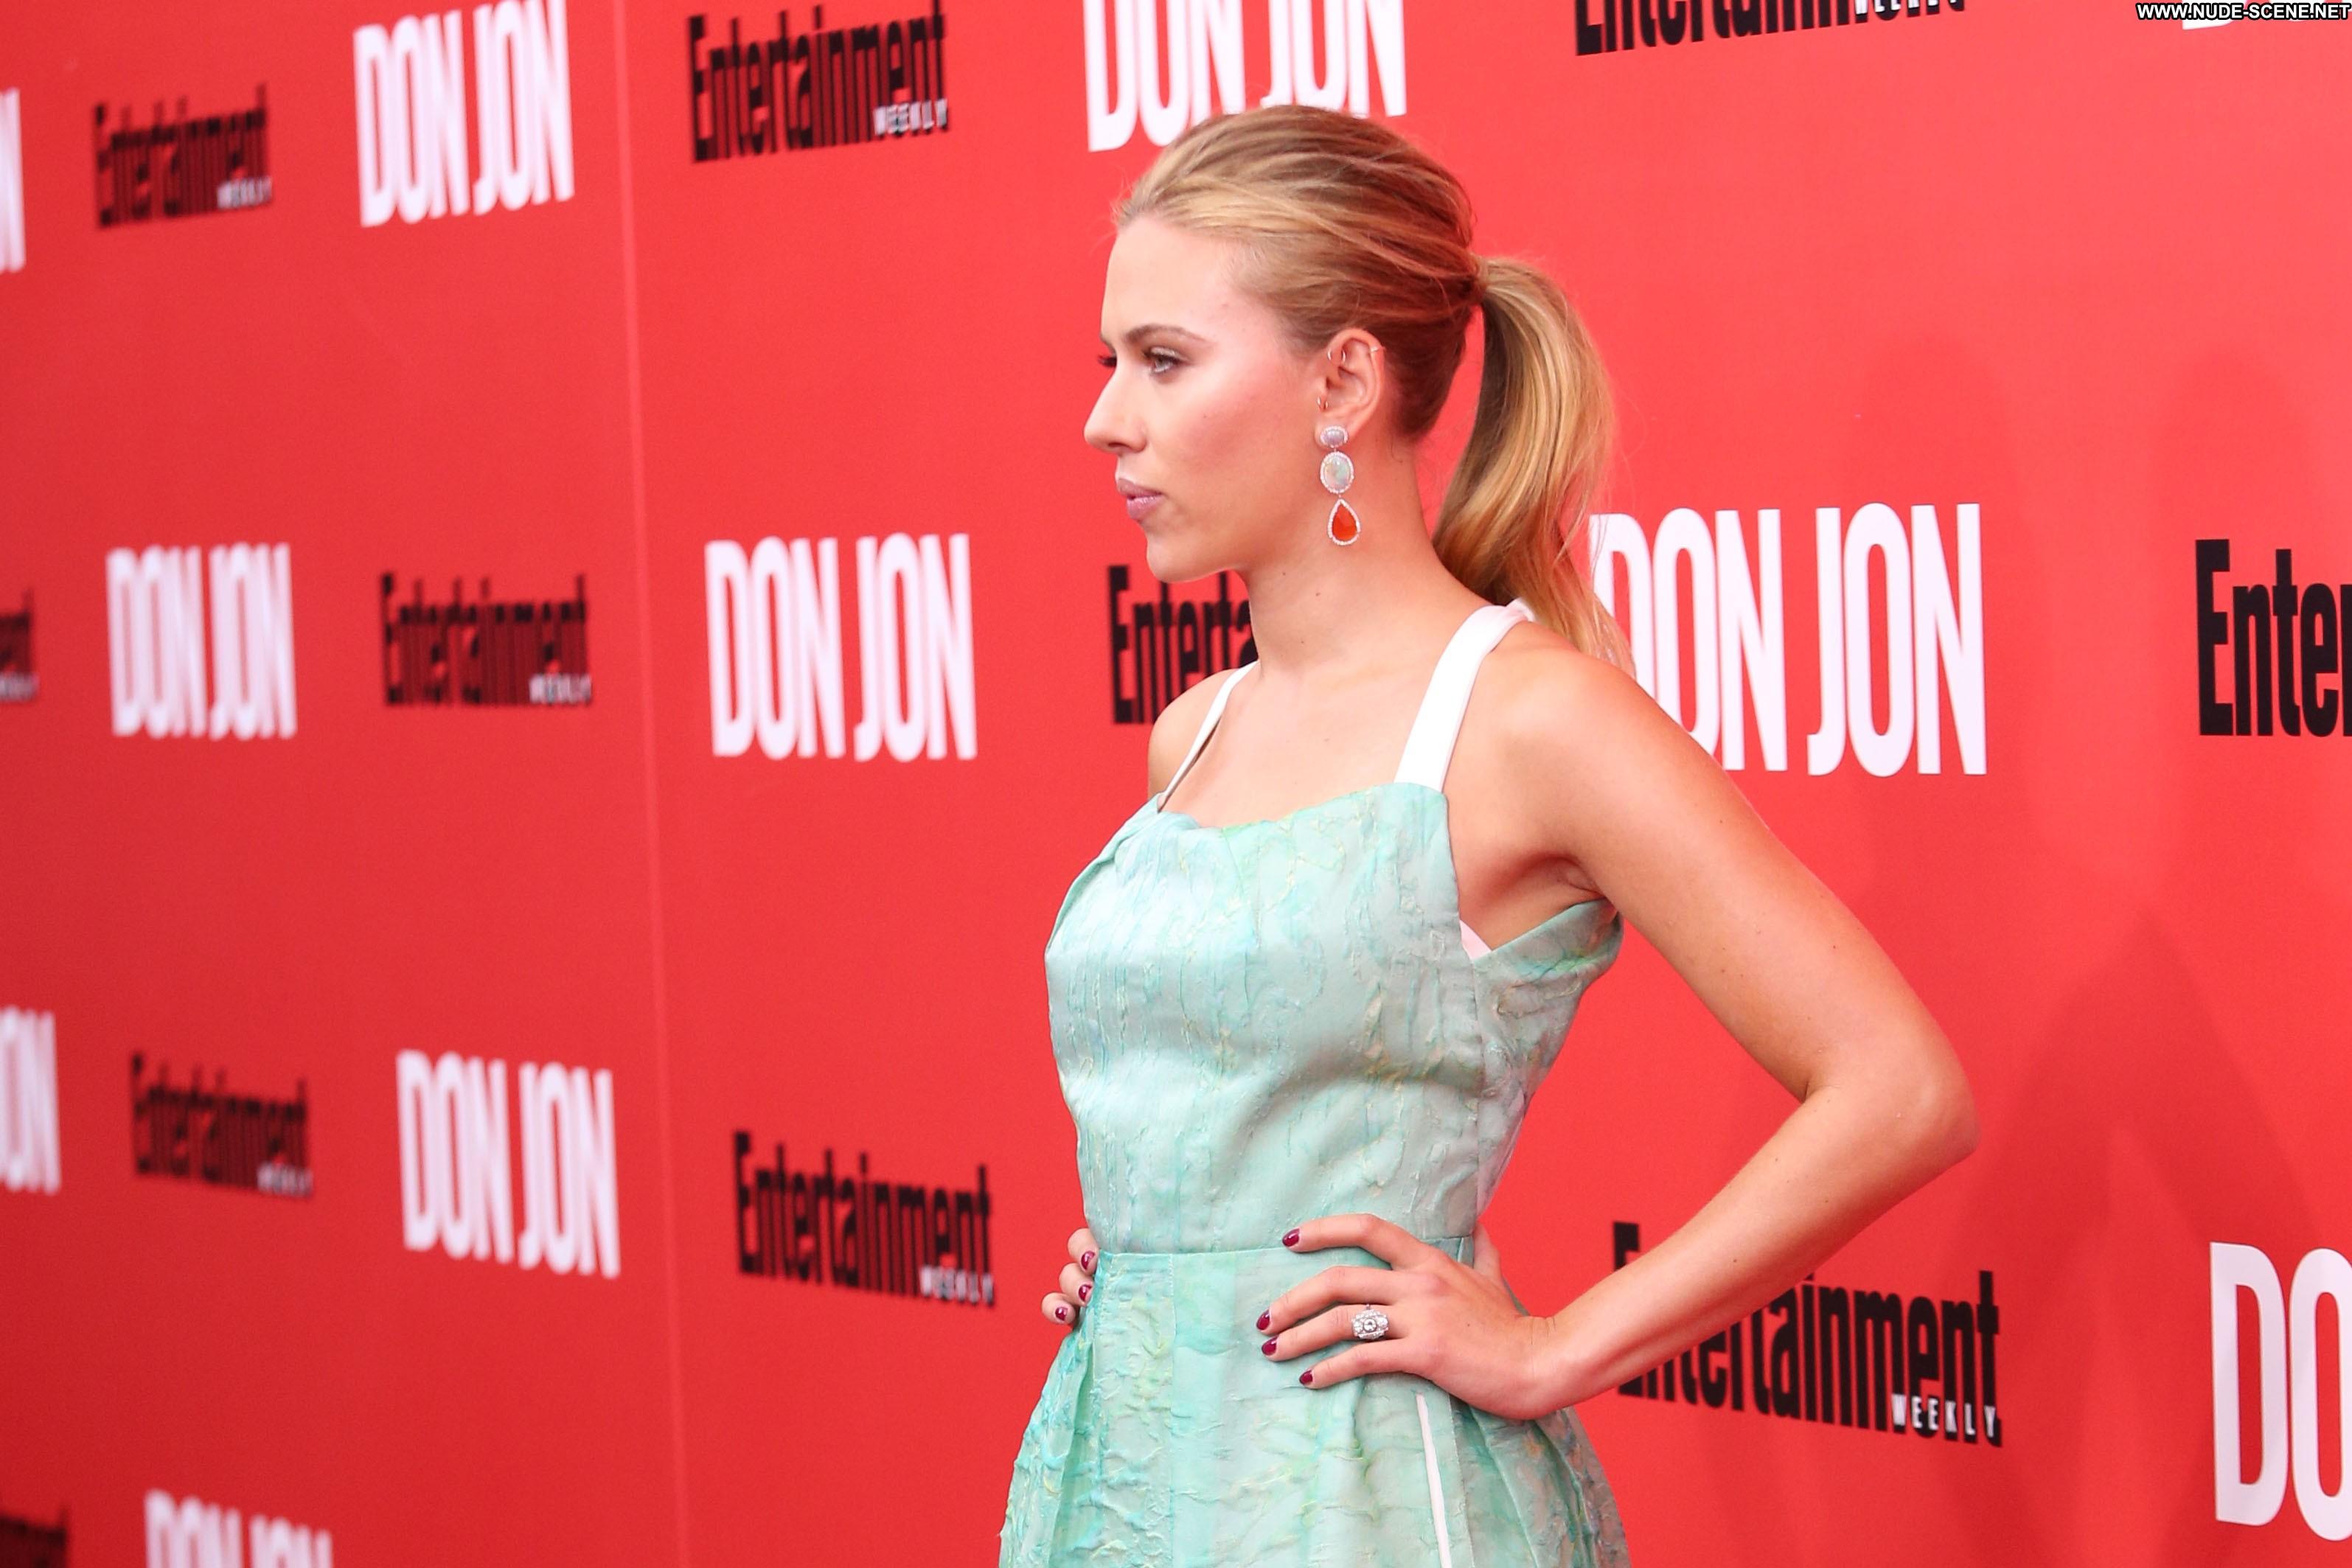 Scarlett Johansson The West Wing The West Wing Celebrity